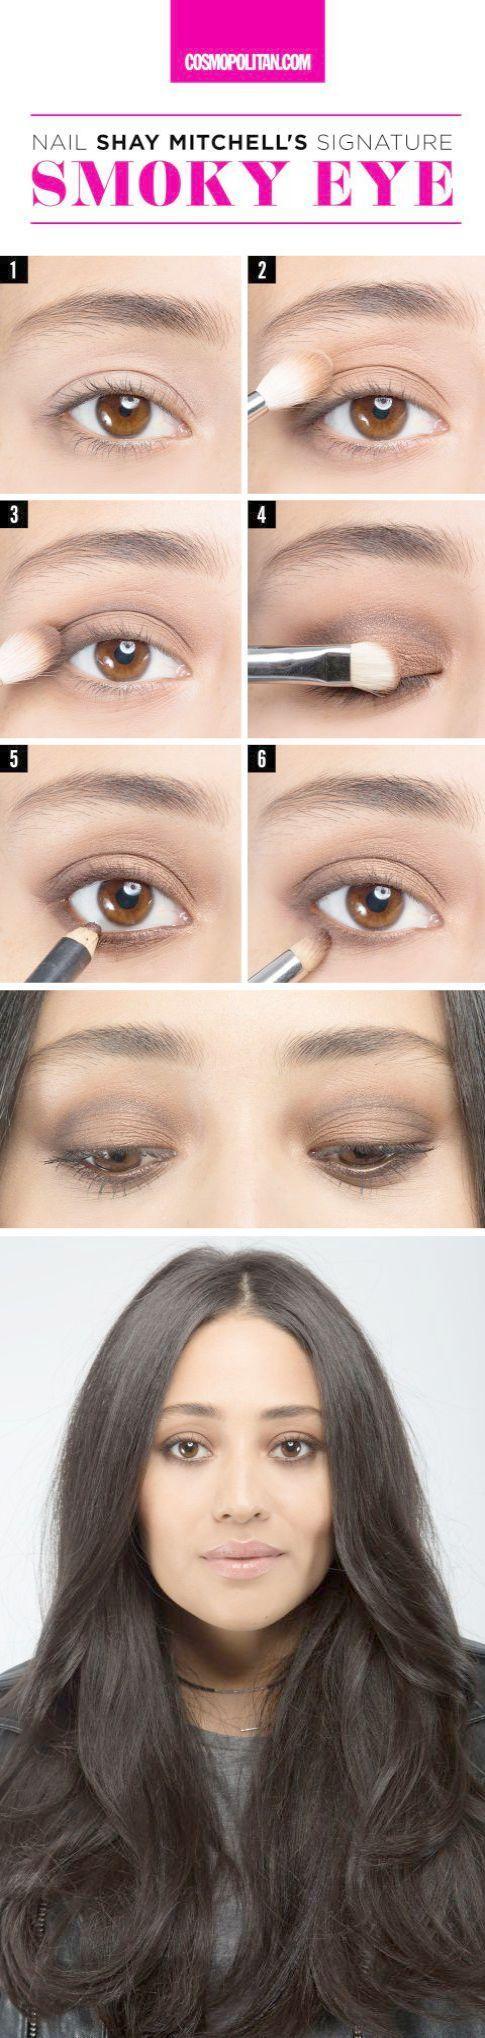 Makeup Geek Netflix either Black Smokey Eye Steps when